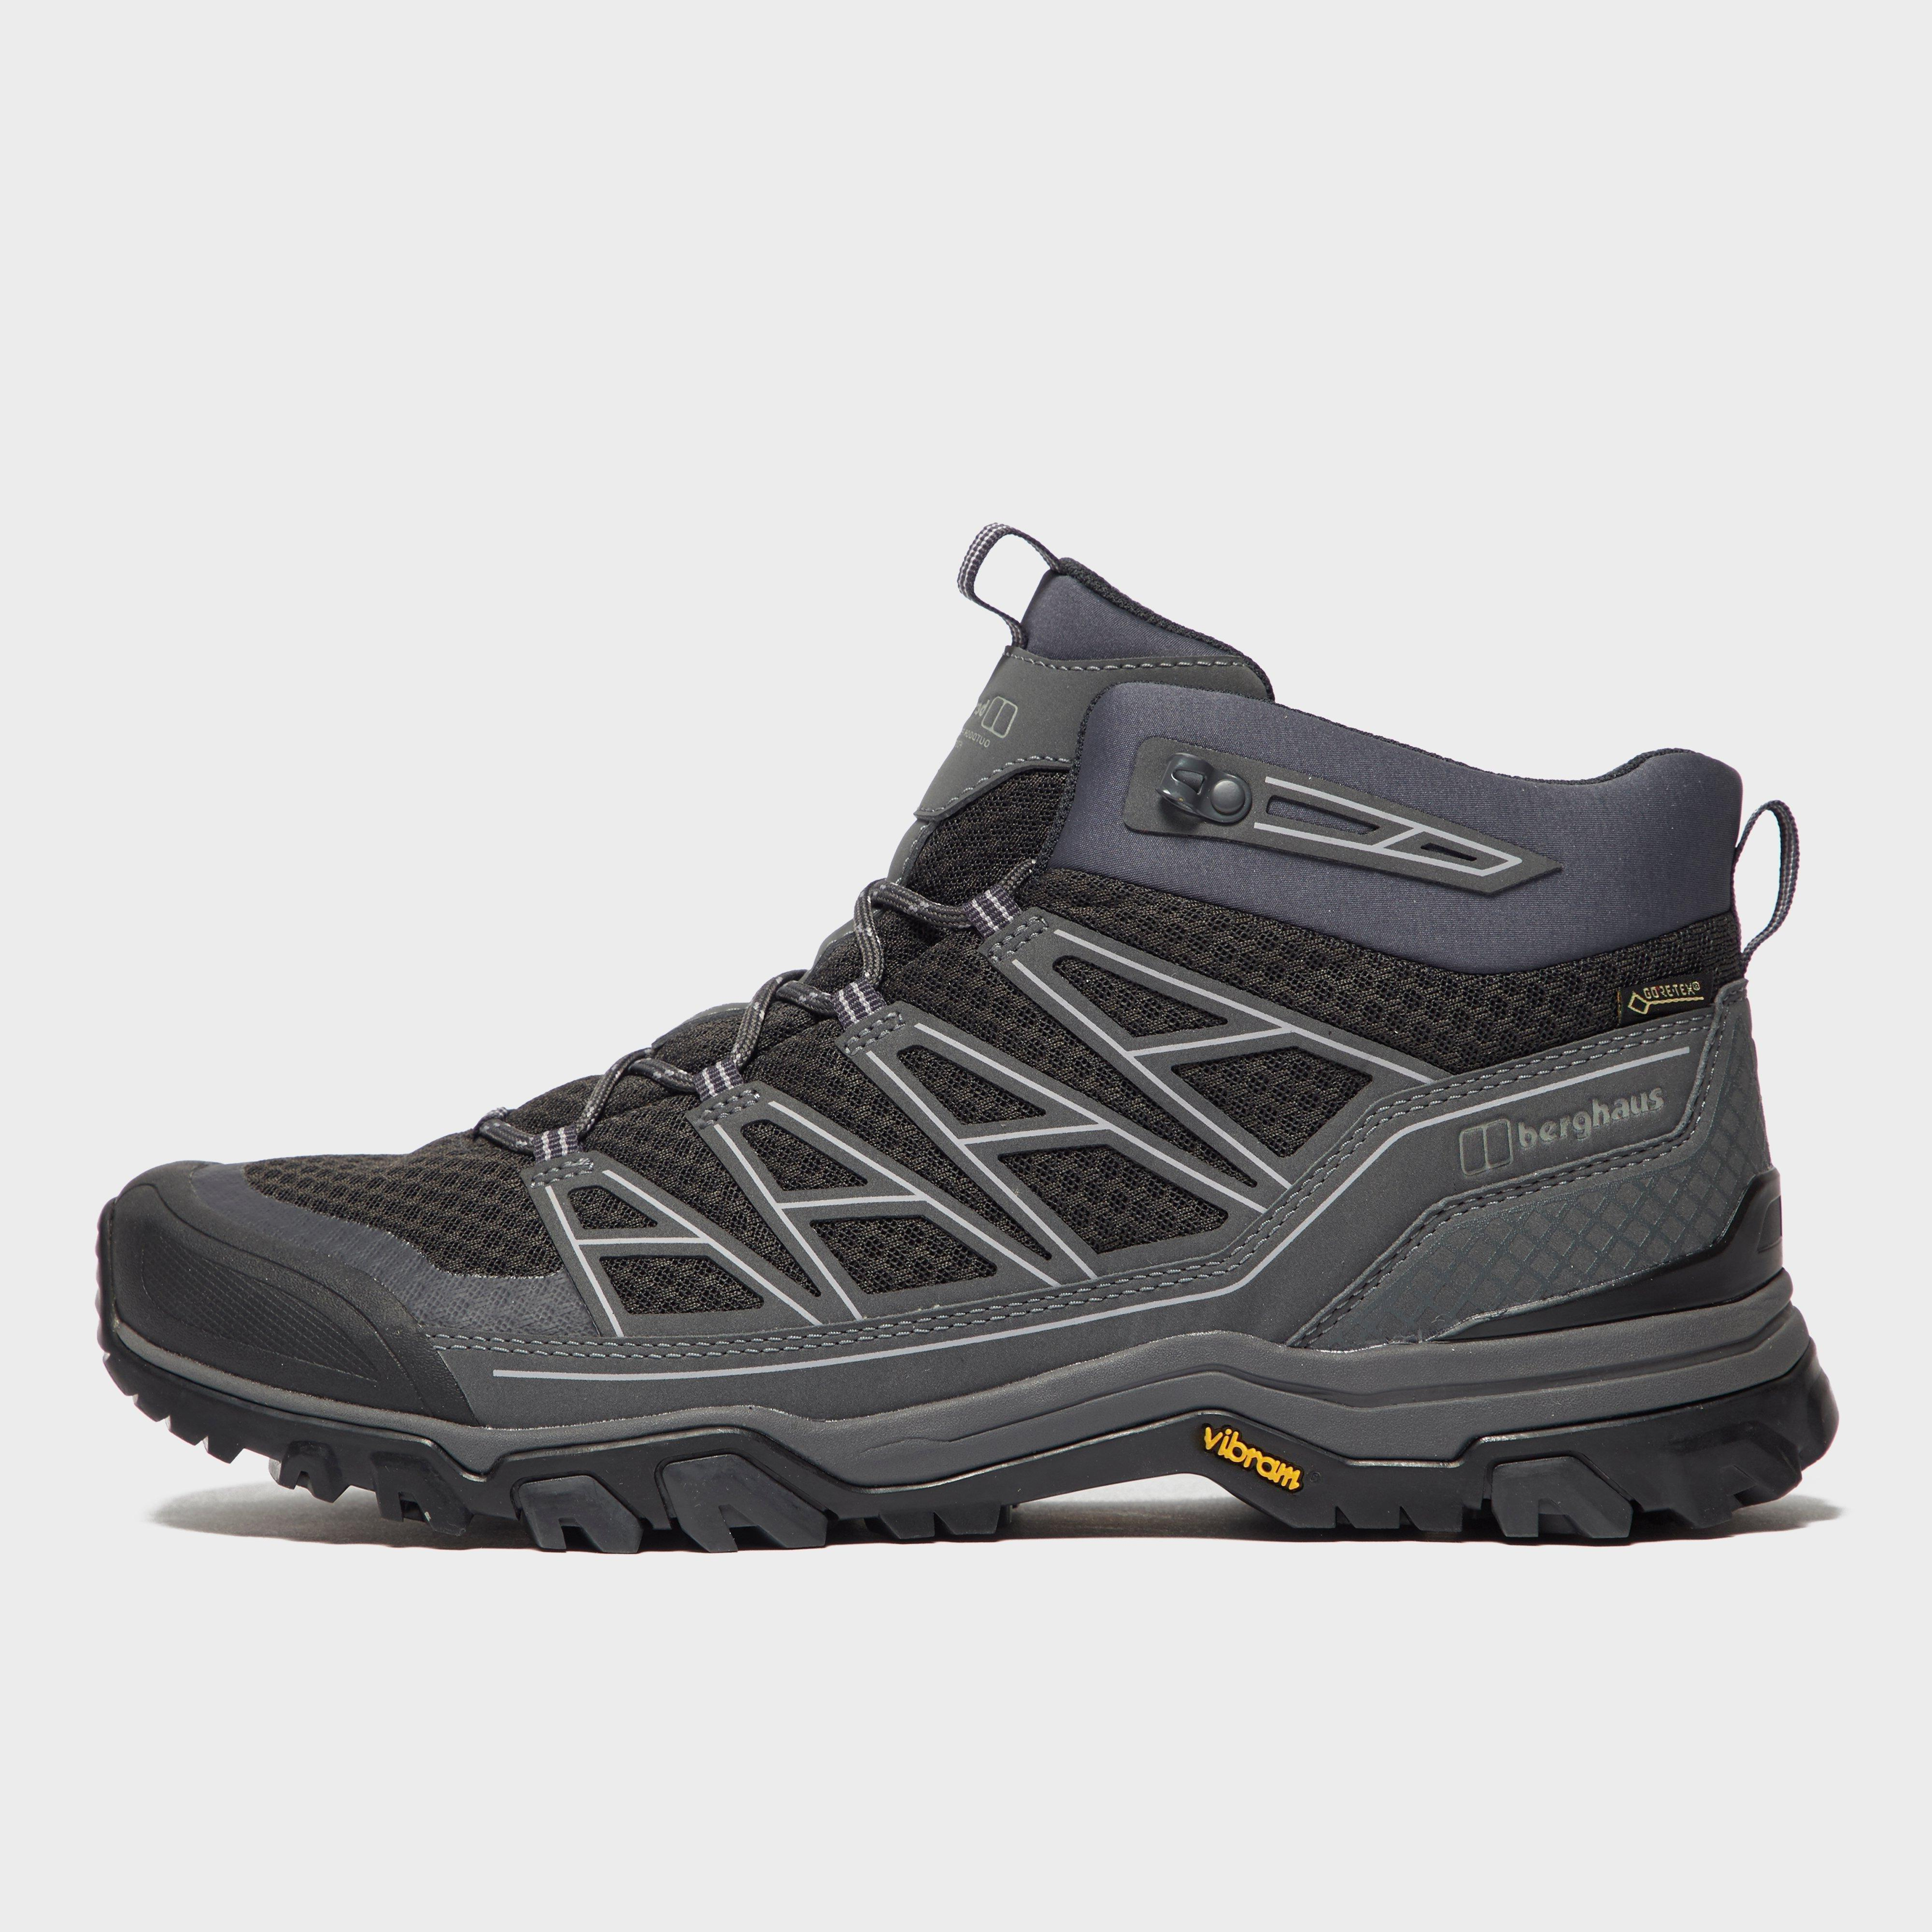 Berghaus Mens Expanse Mid Gore-tex  Walking Boots - Grey/dgy  Grey/dgy